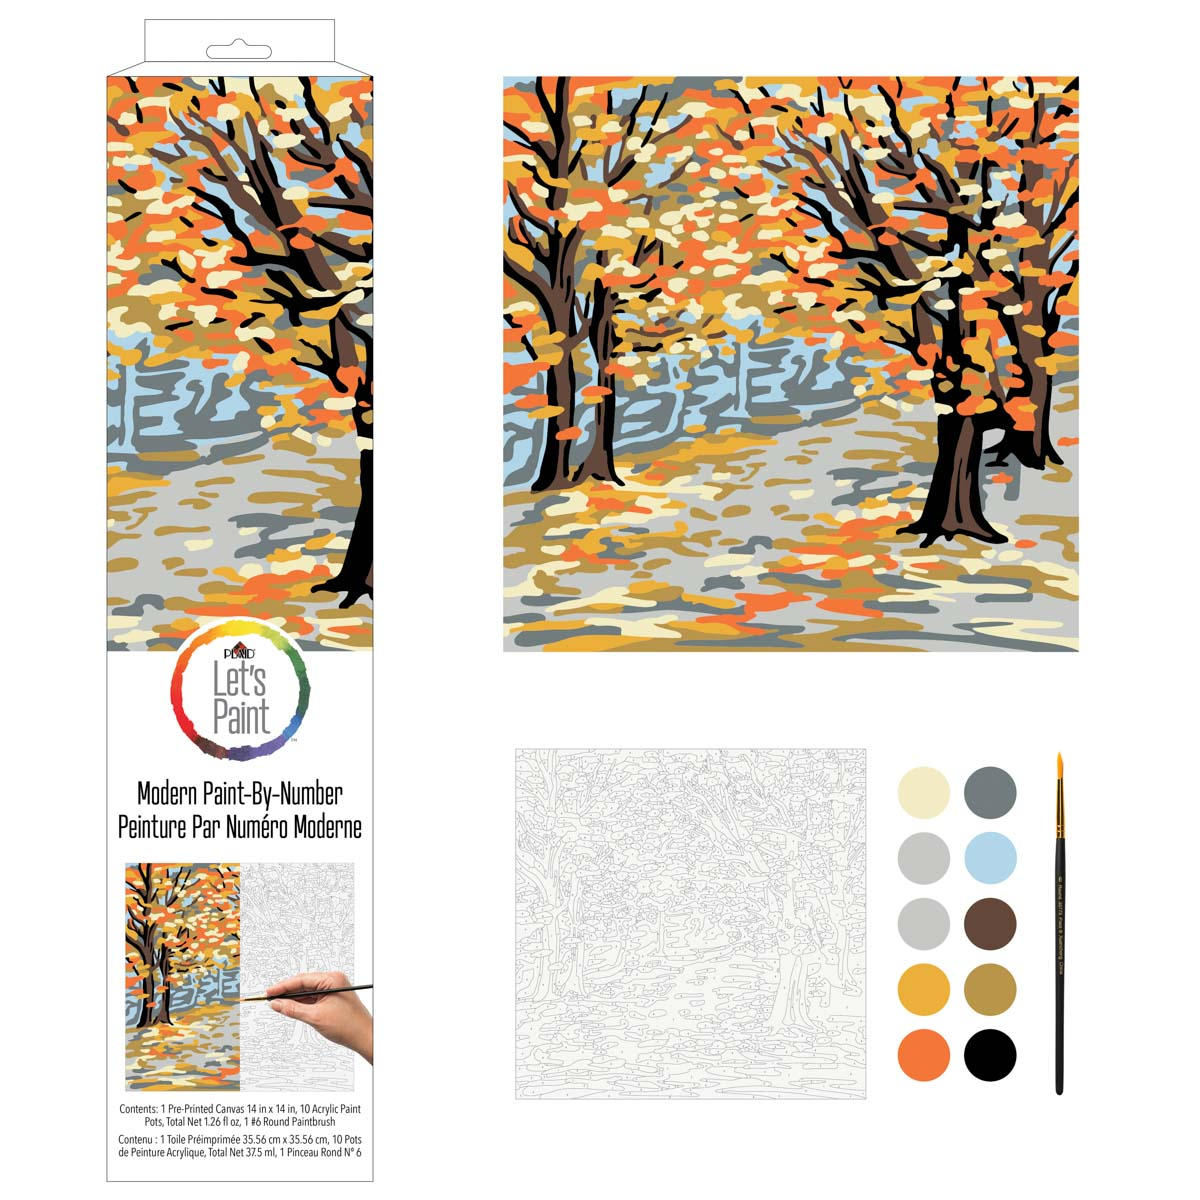 Plaid ® Let's Paint™ Modern Paint-by-Number - Fall Landscape - 17912